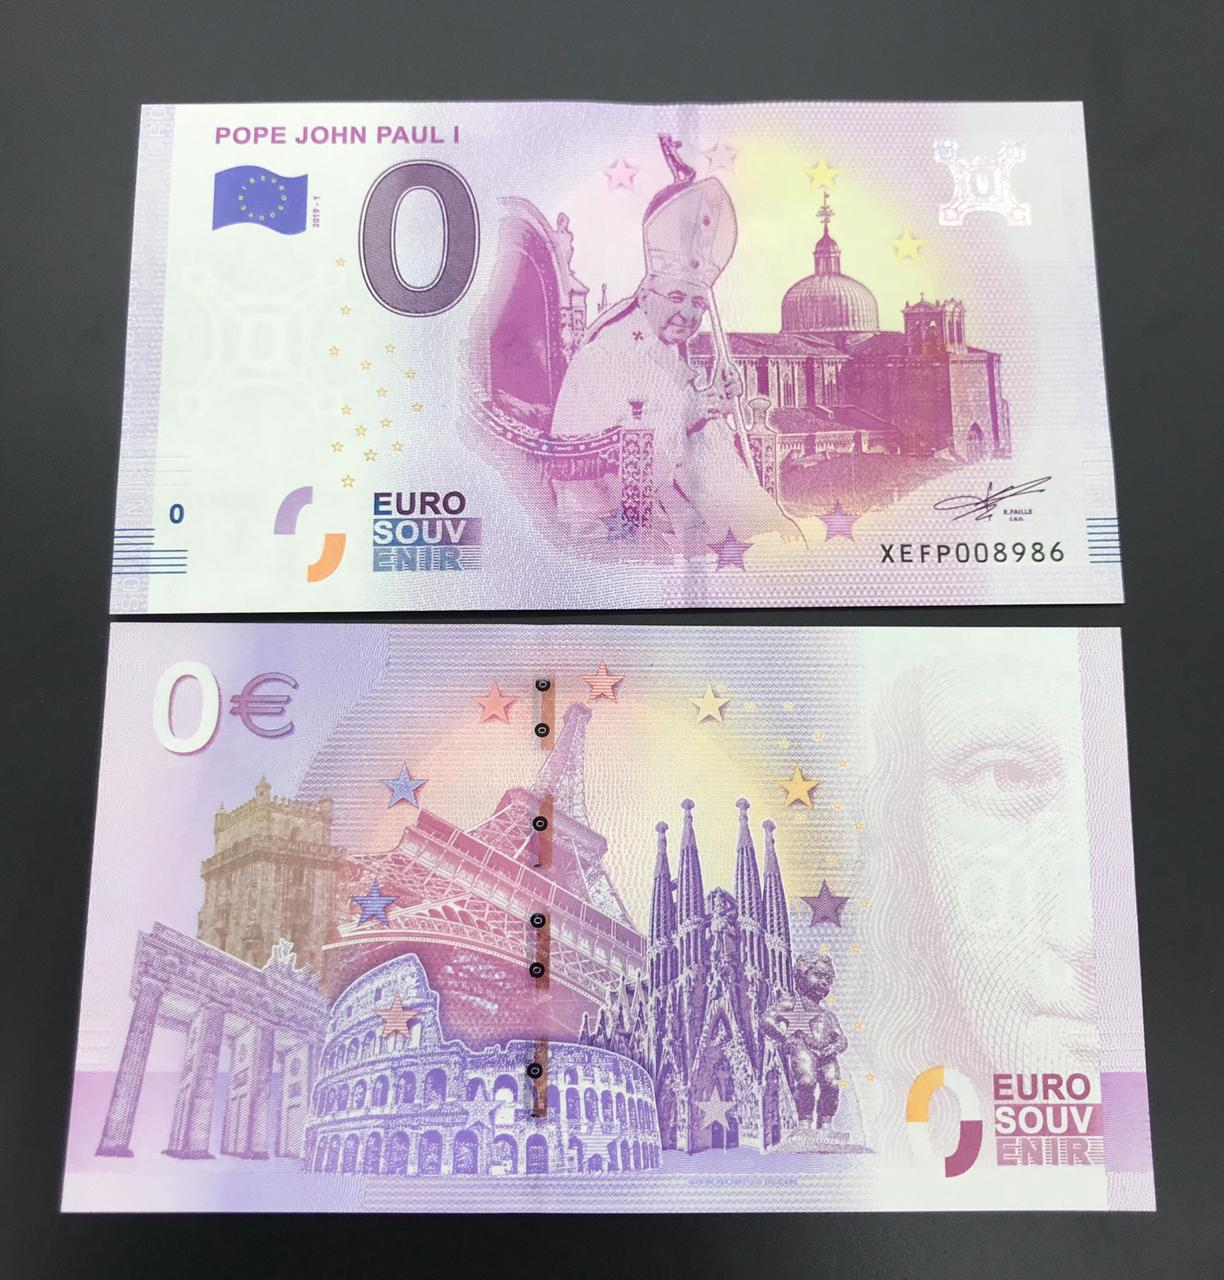 Cédula 0 Euro Papa JOÃO PAULO I